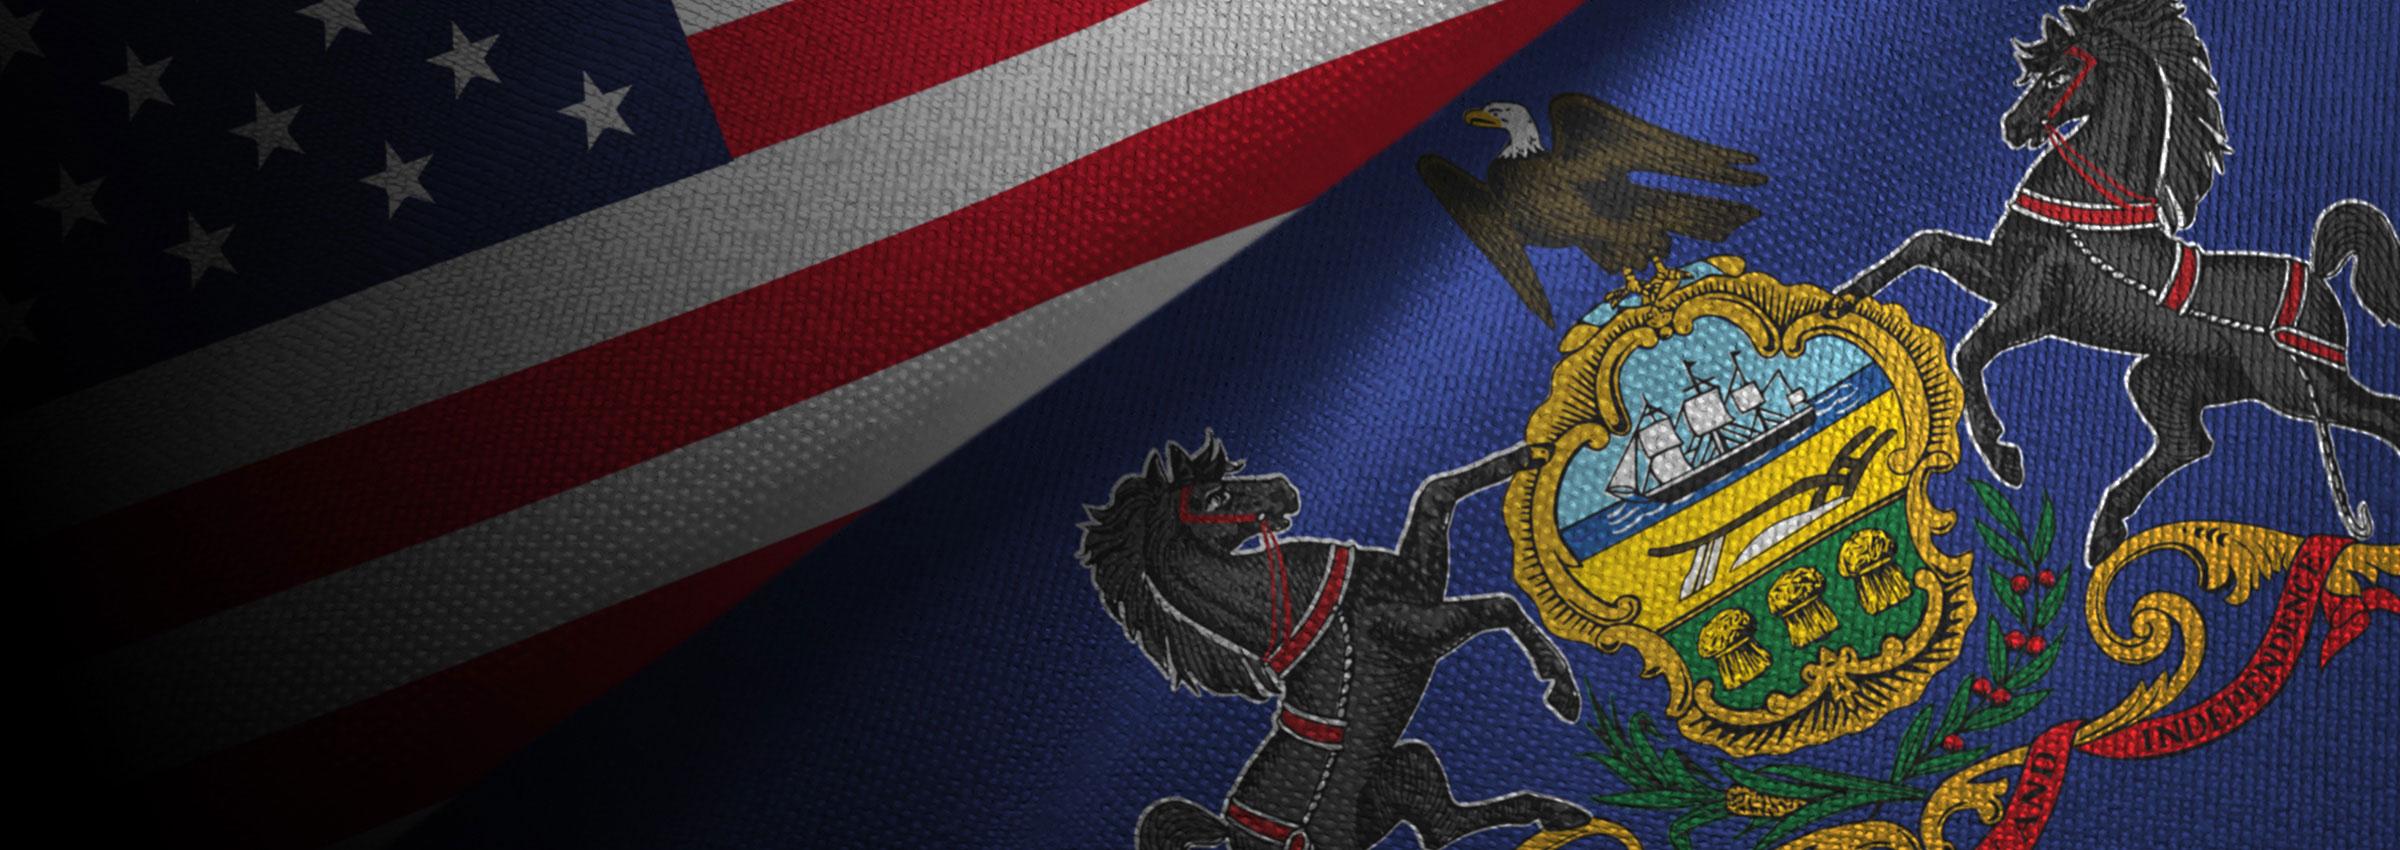 American flag and Pennsylvania flag